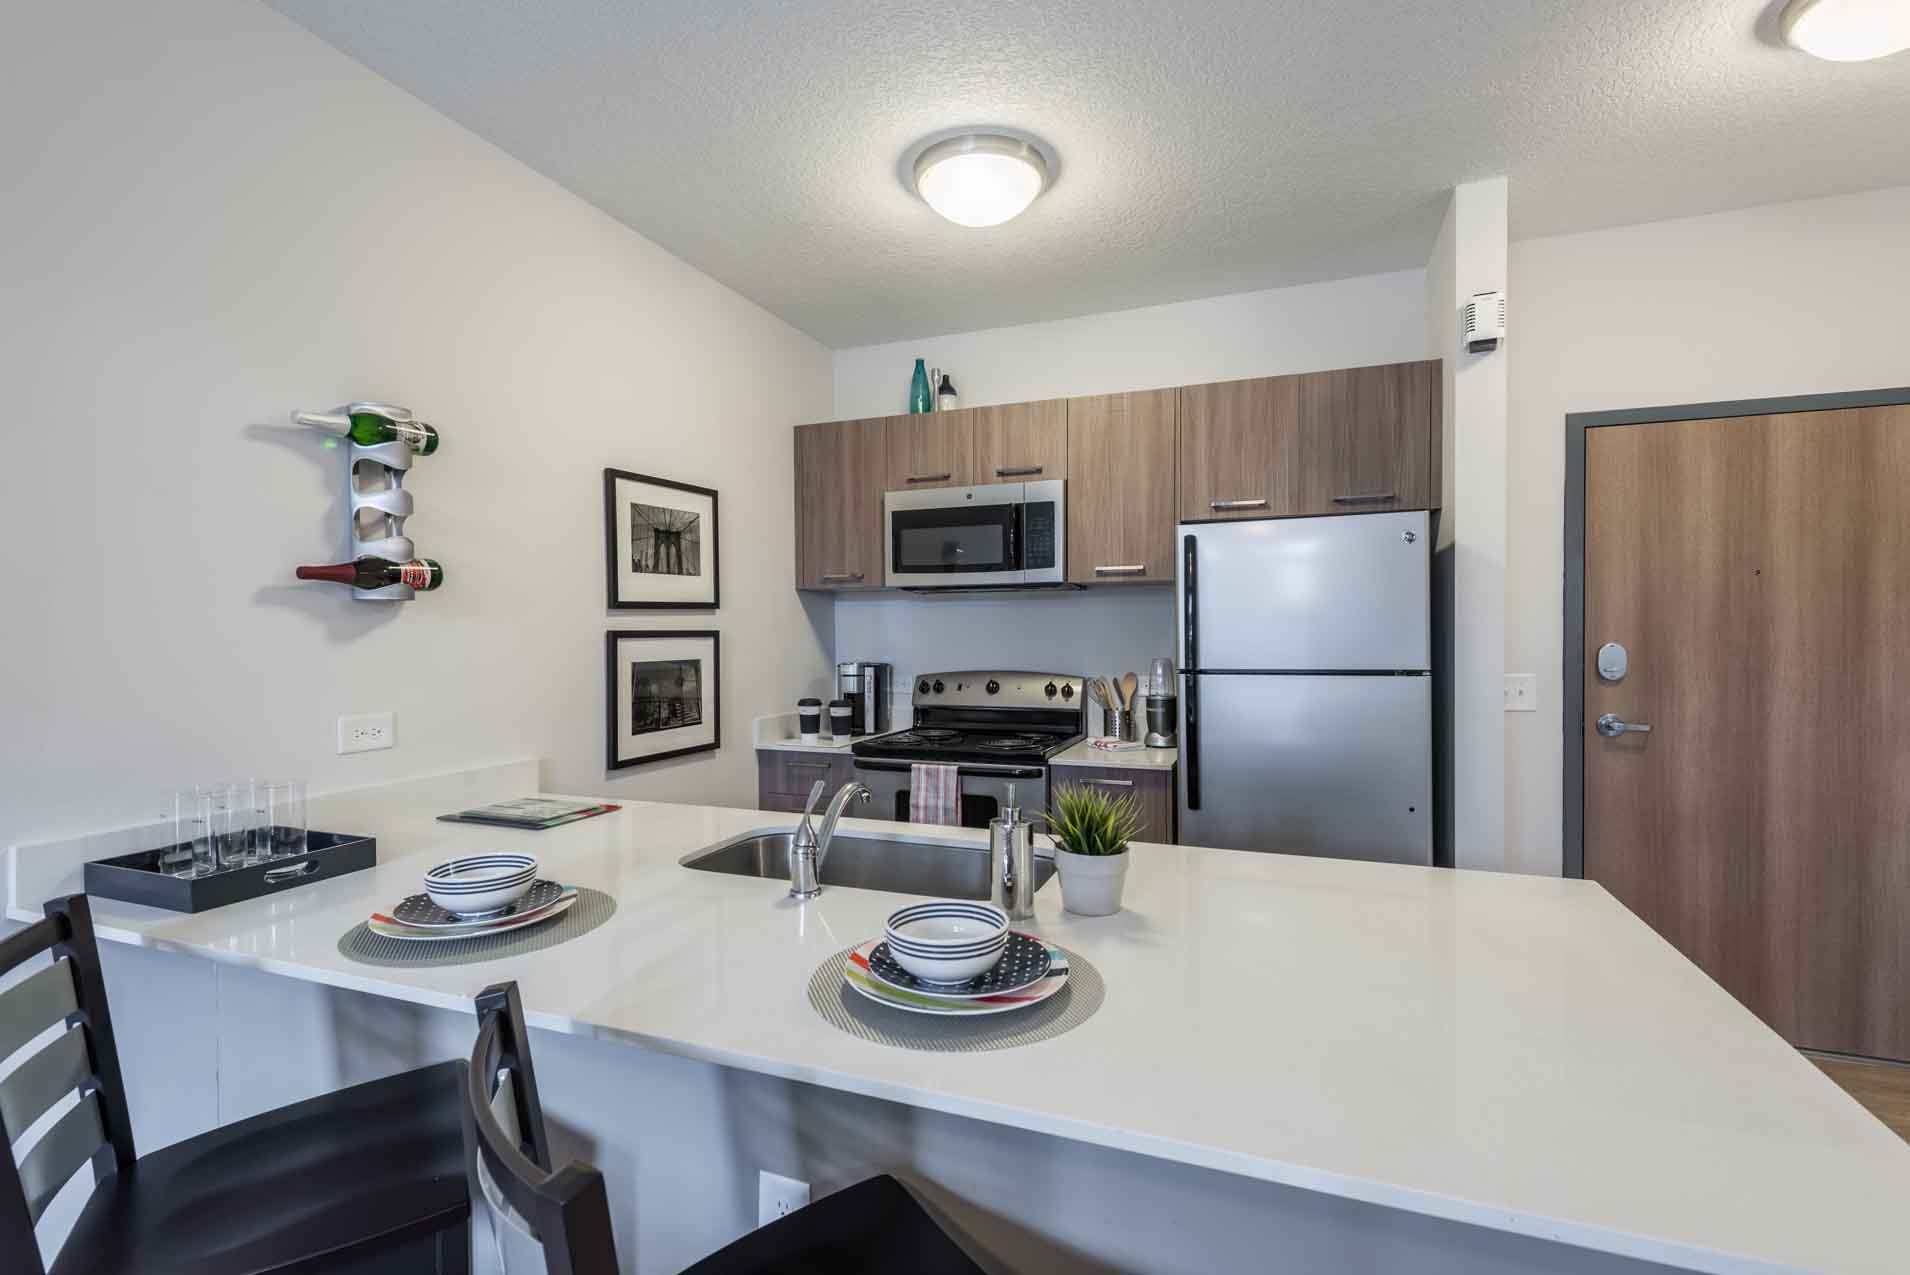 4th-Street-Commons-Miami-Kitchen3-Unilodgers